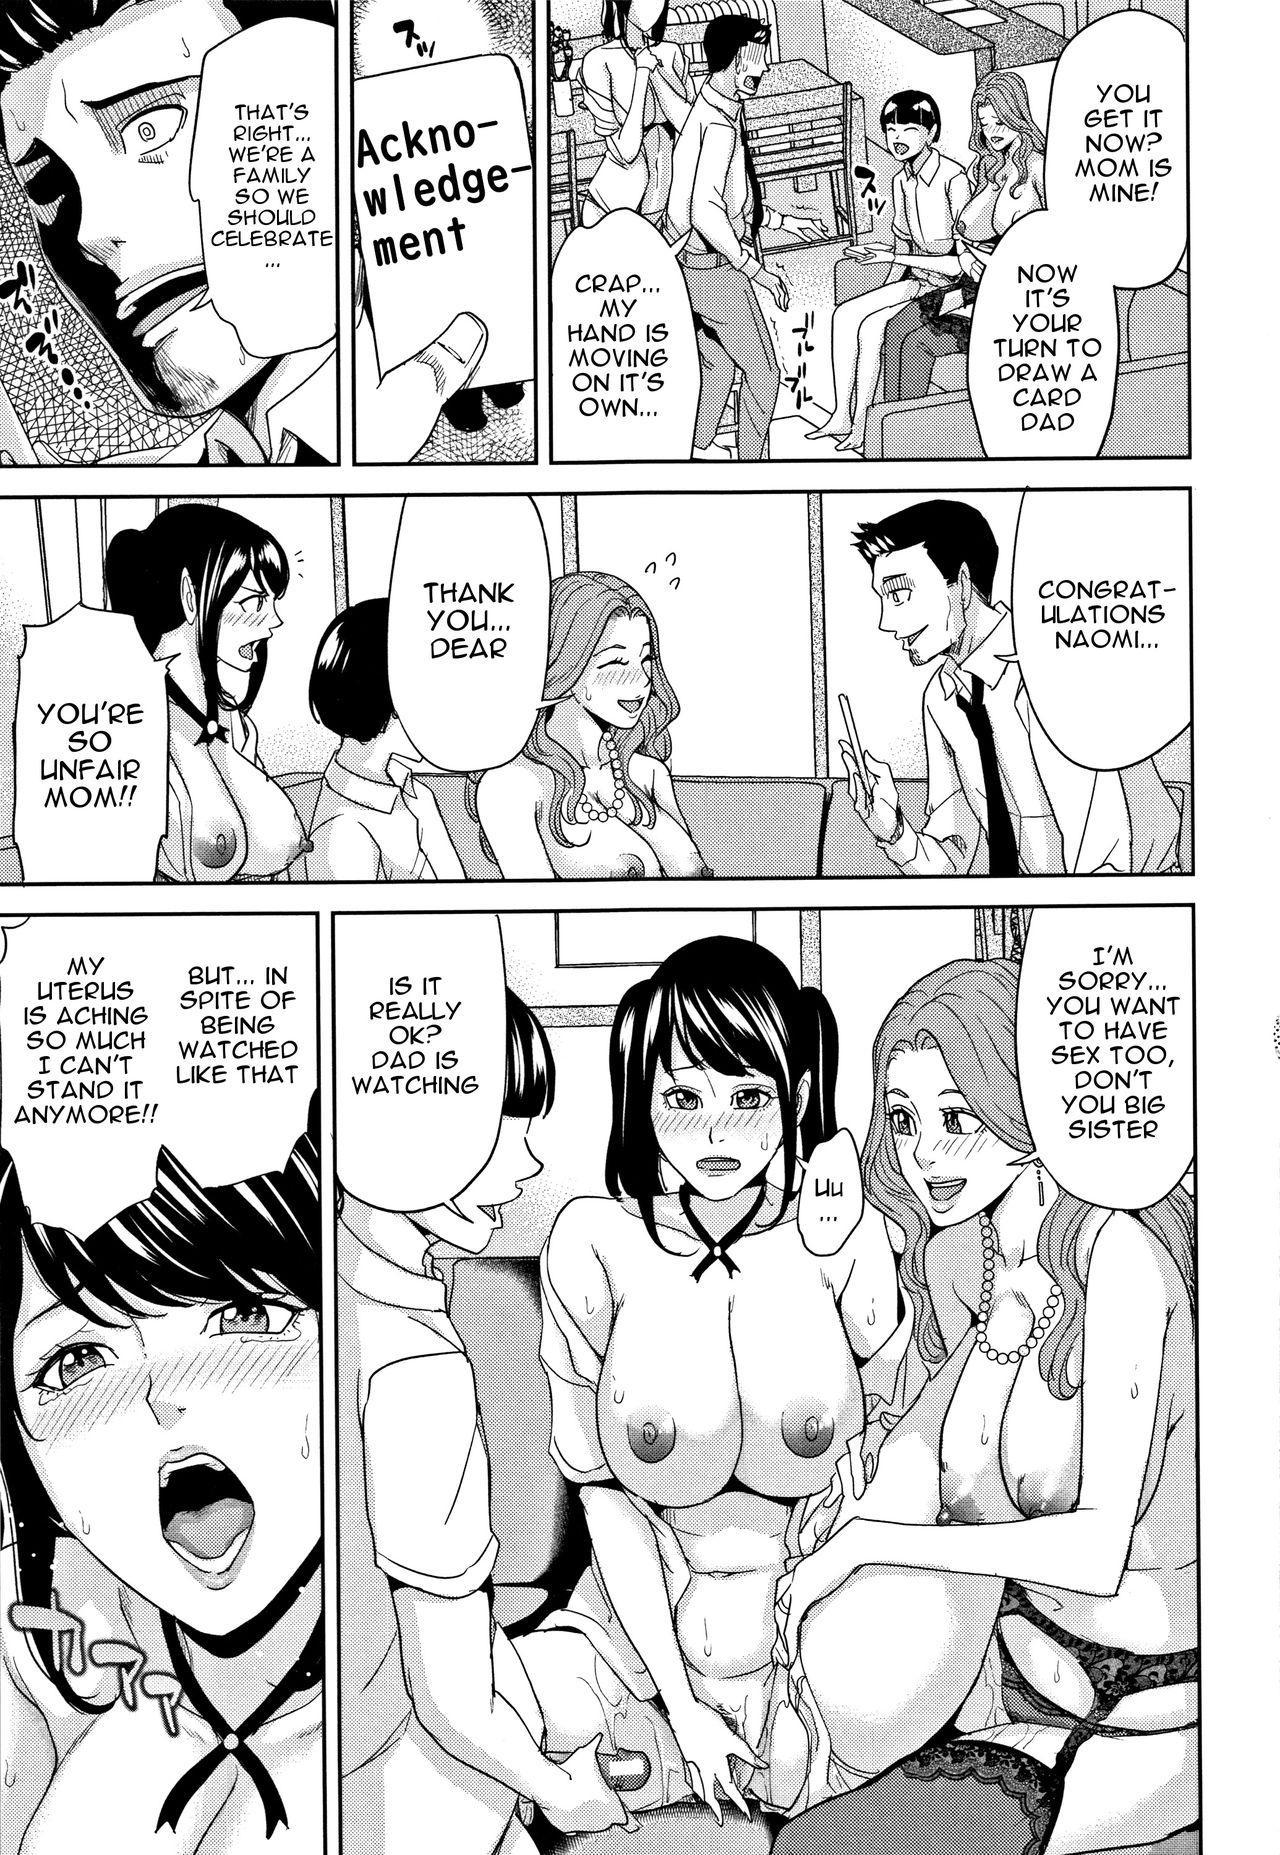 [Maimu-Maimu] Kazoku Soukan Game - family Incest game Ch. 1-3 [English] [Januz] 81